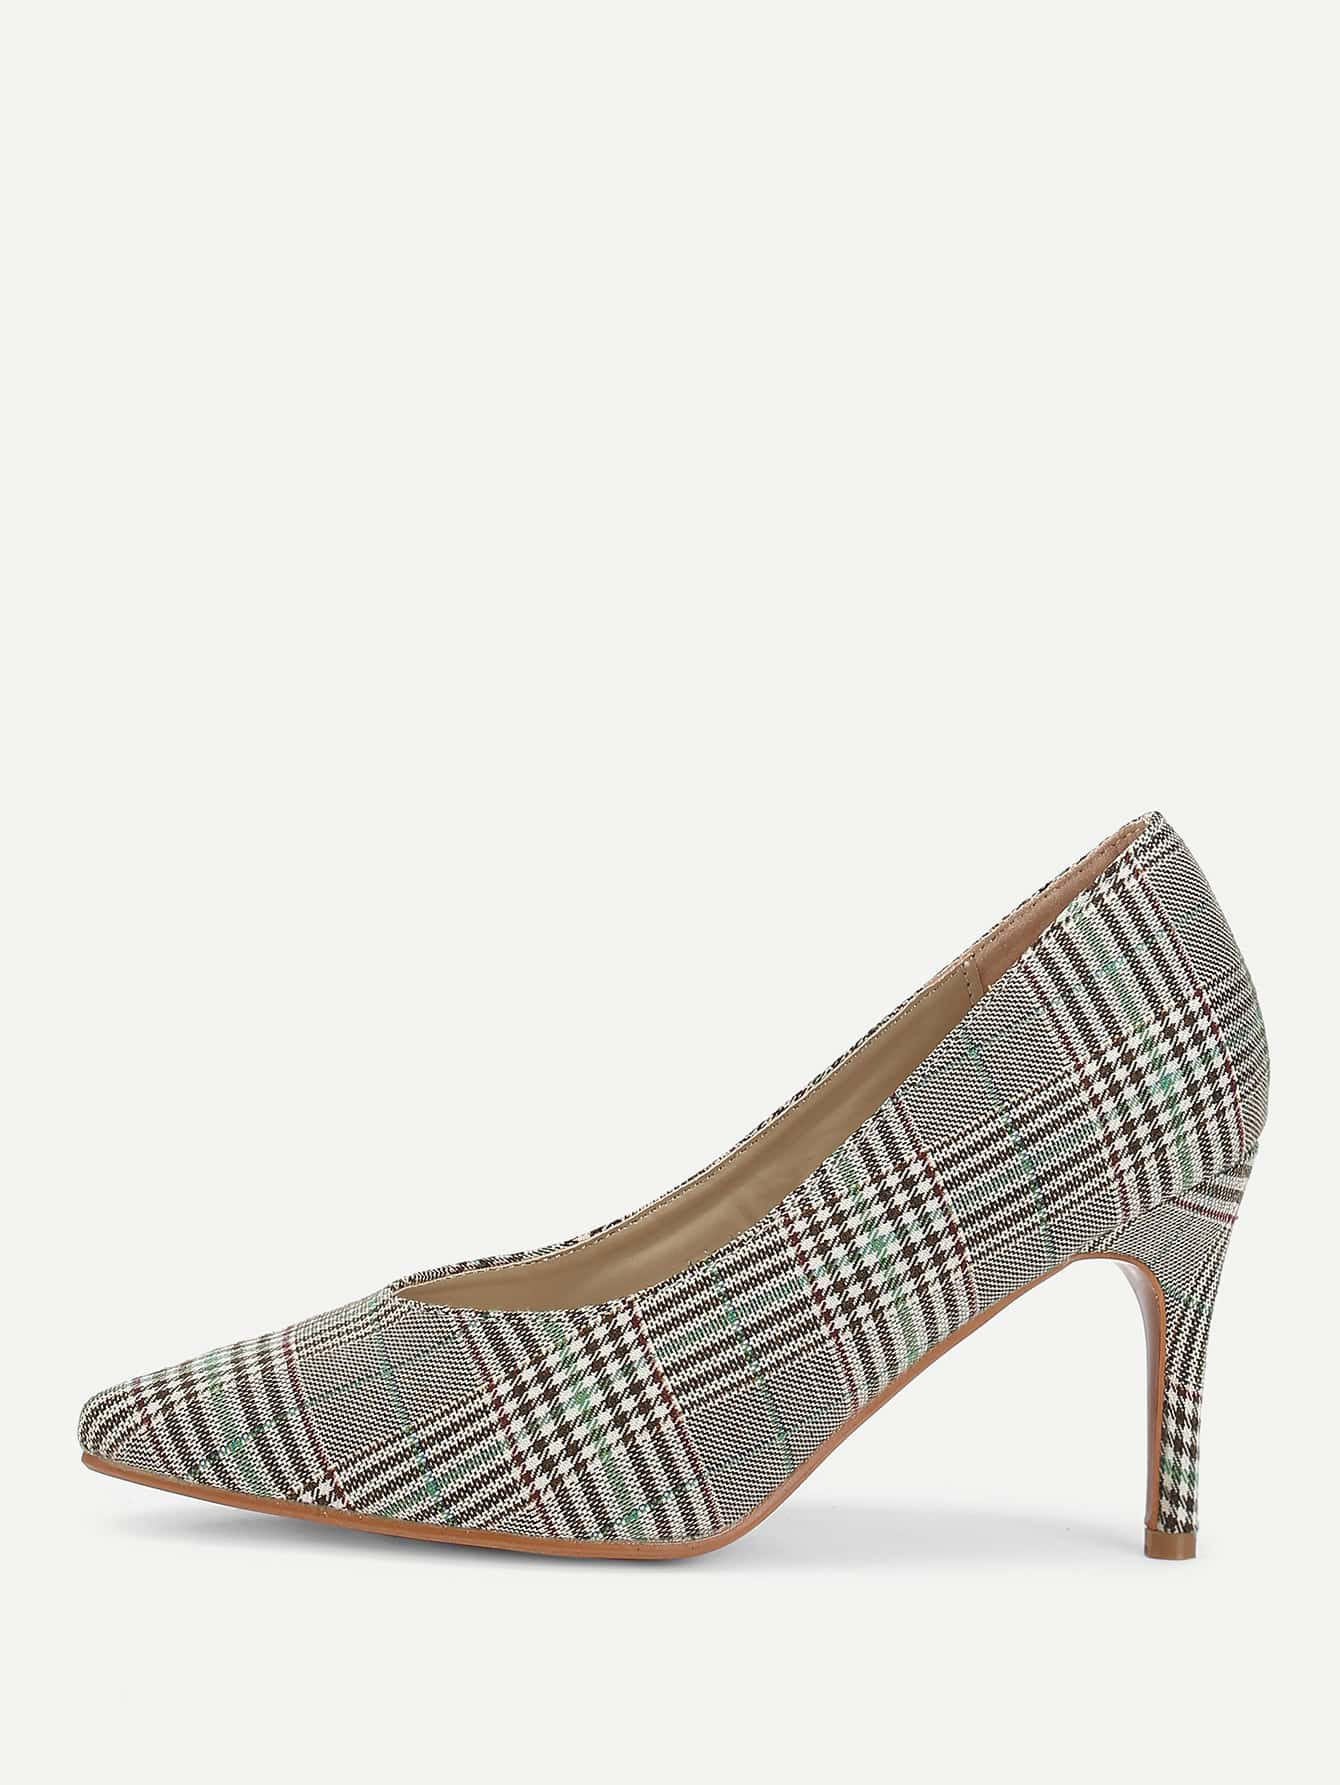 Gingham Print Pointed Toe Stiletto Heels цена 2017